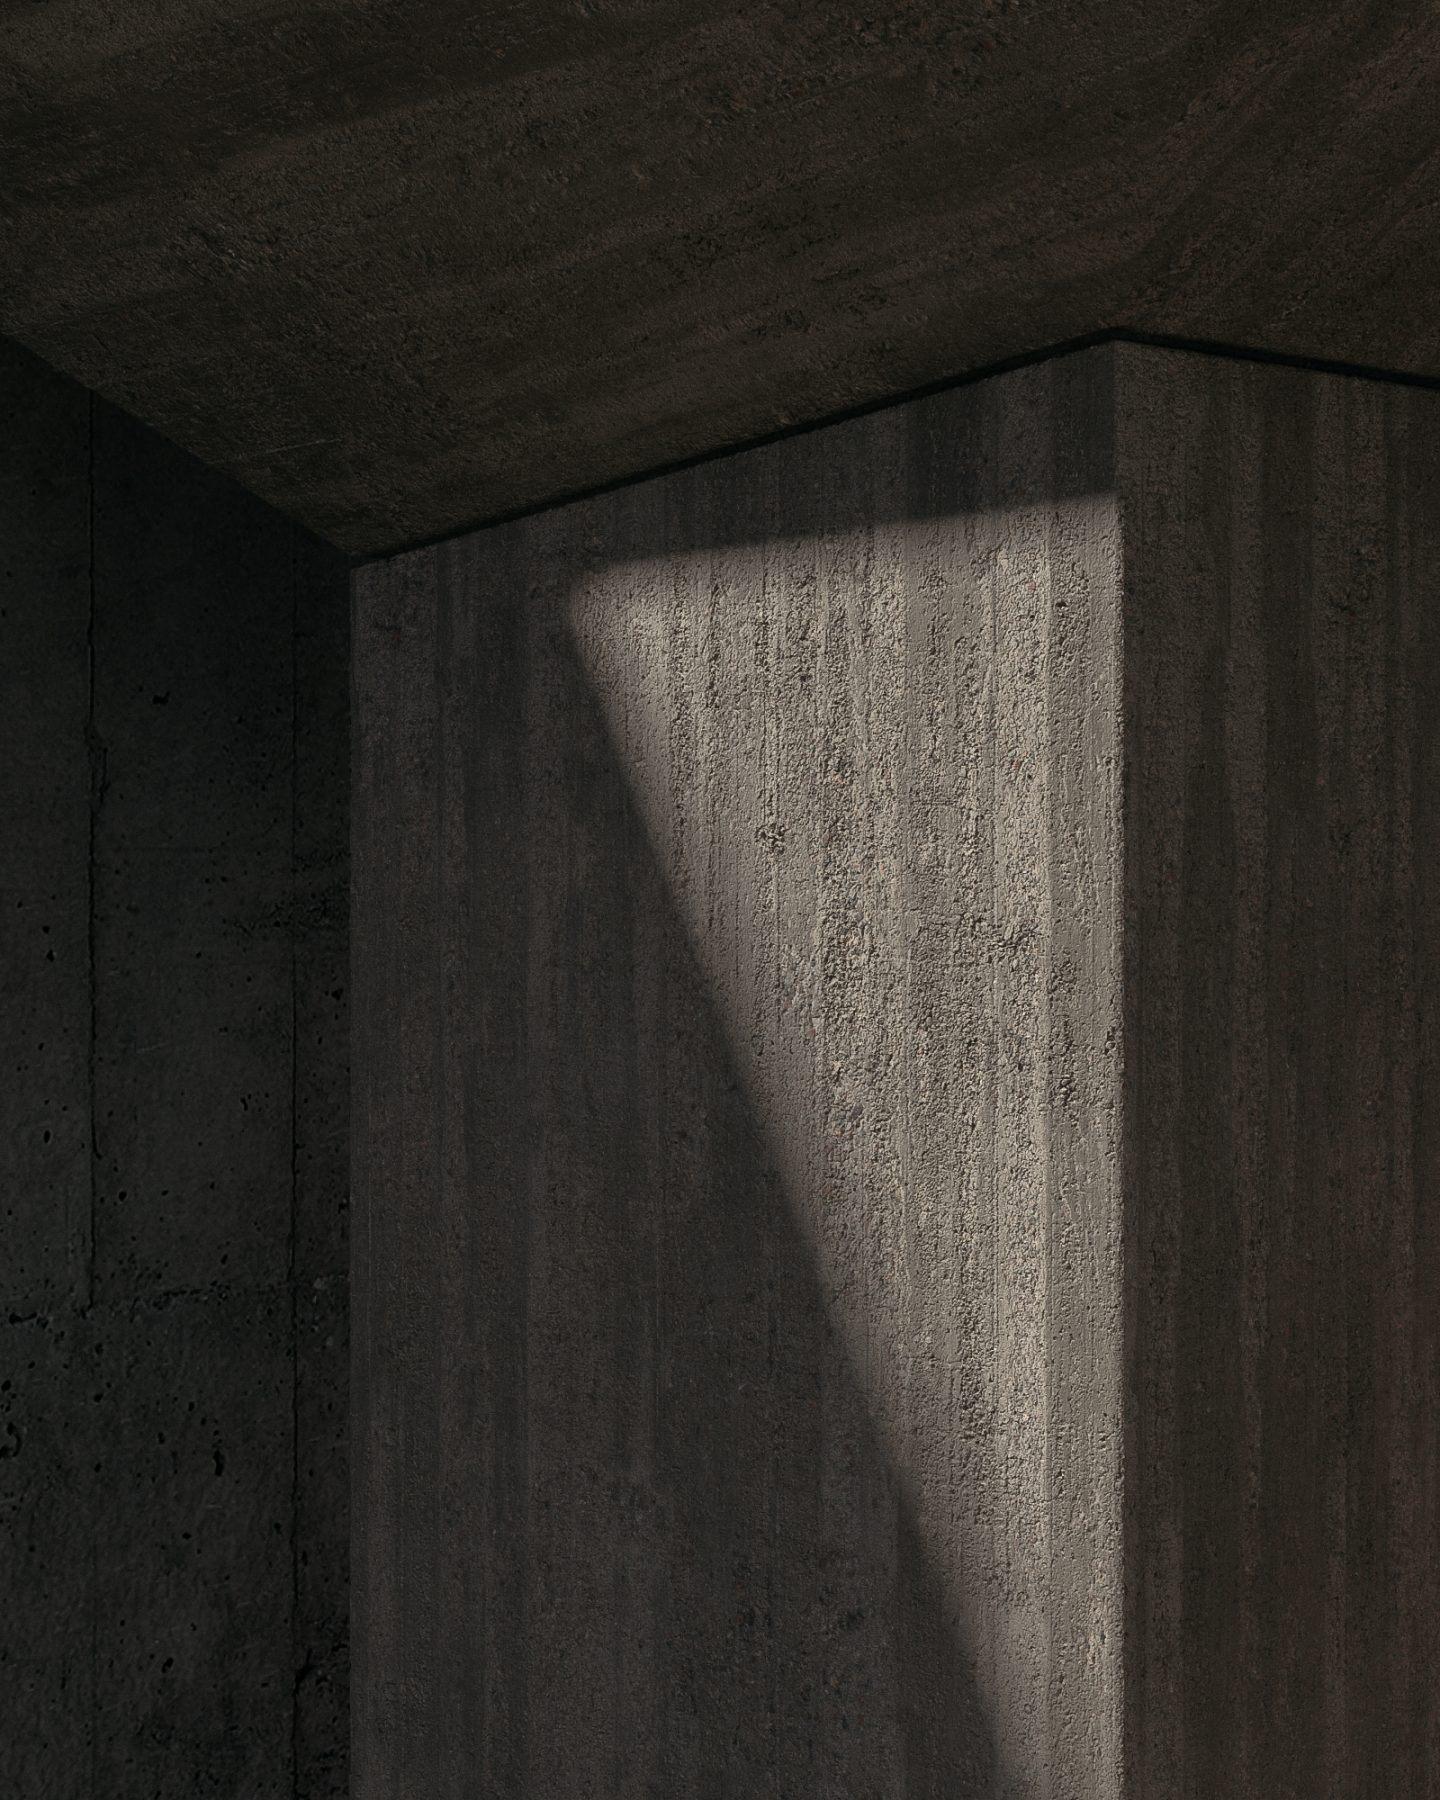 IGNANT-Tesla-cybertruck-cgi-brutalism-cgi-editorial-13